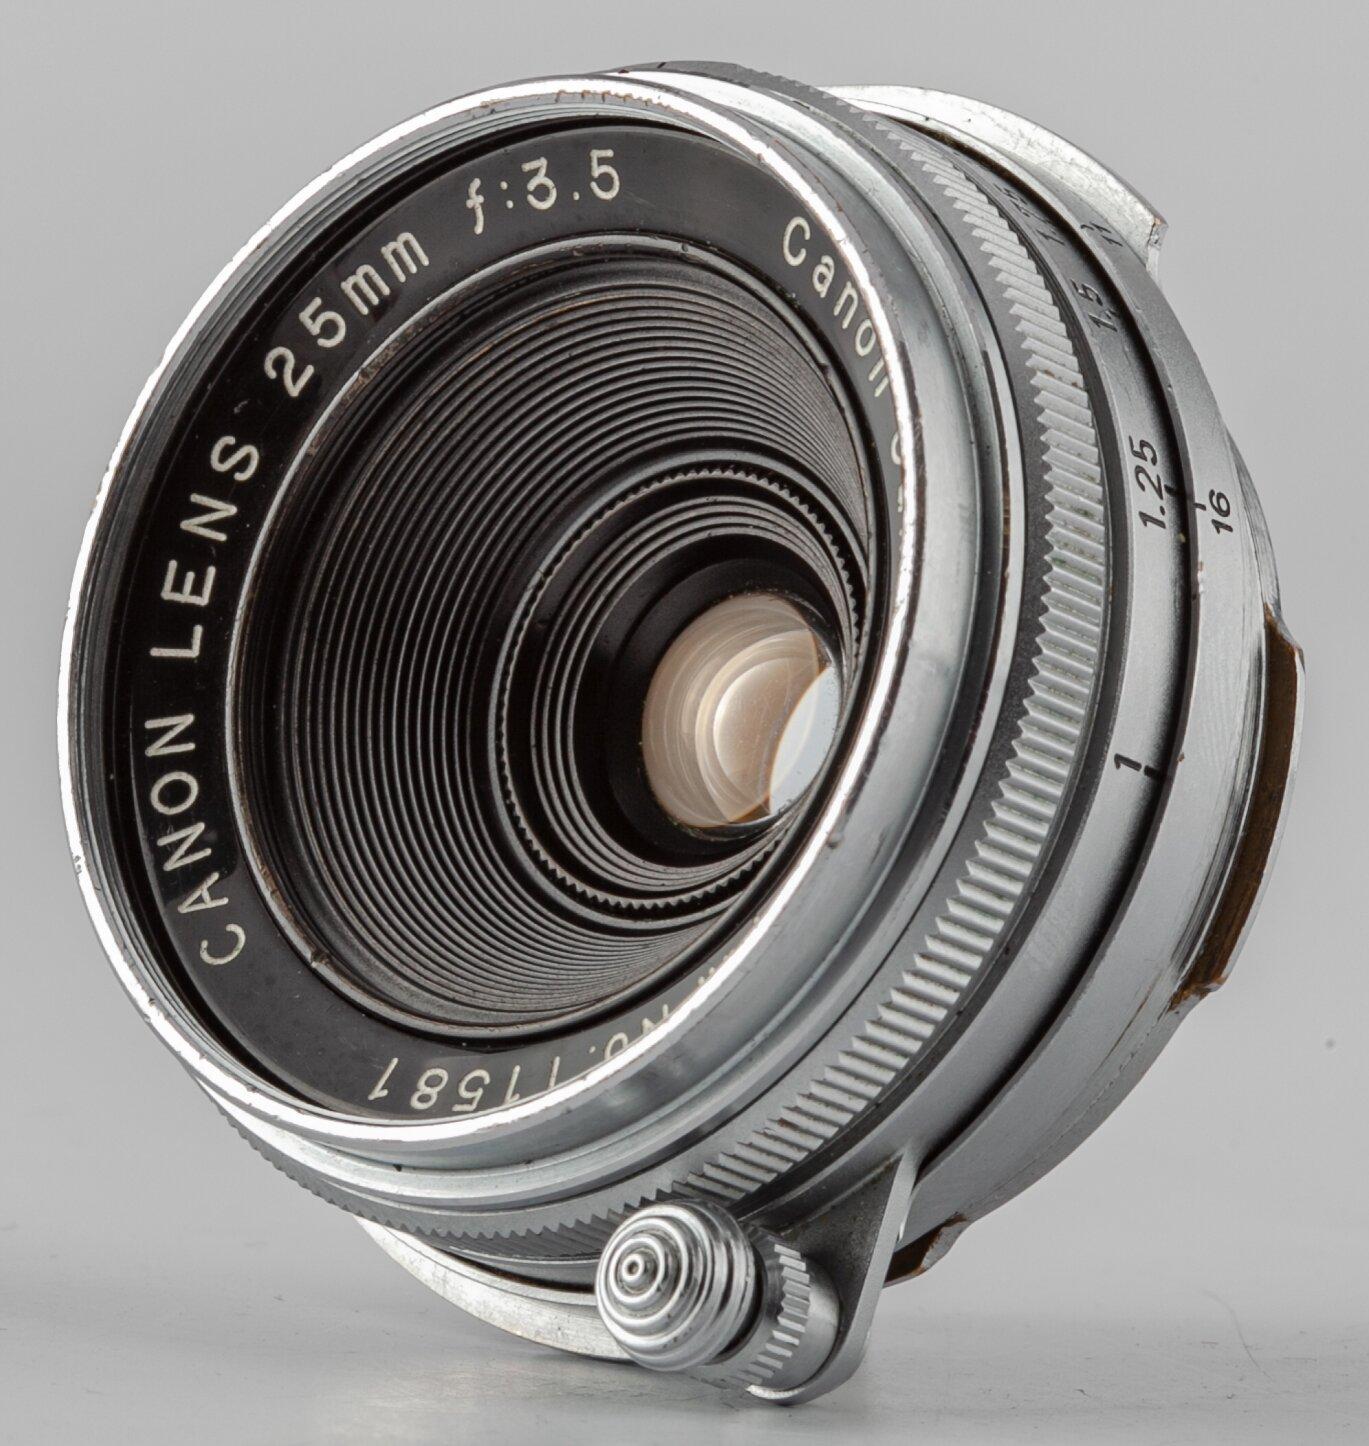 Canon Rangefinder 25/3.5 Lens for Canon RF 3.5/25mm  Canon Lens very Rare!